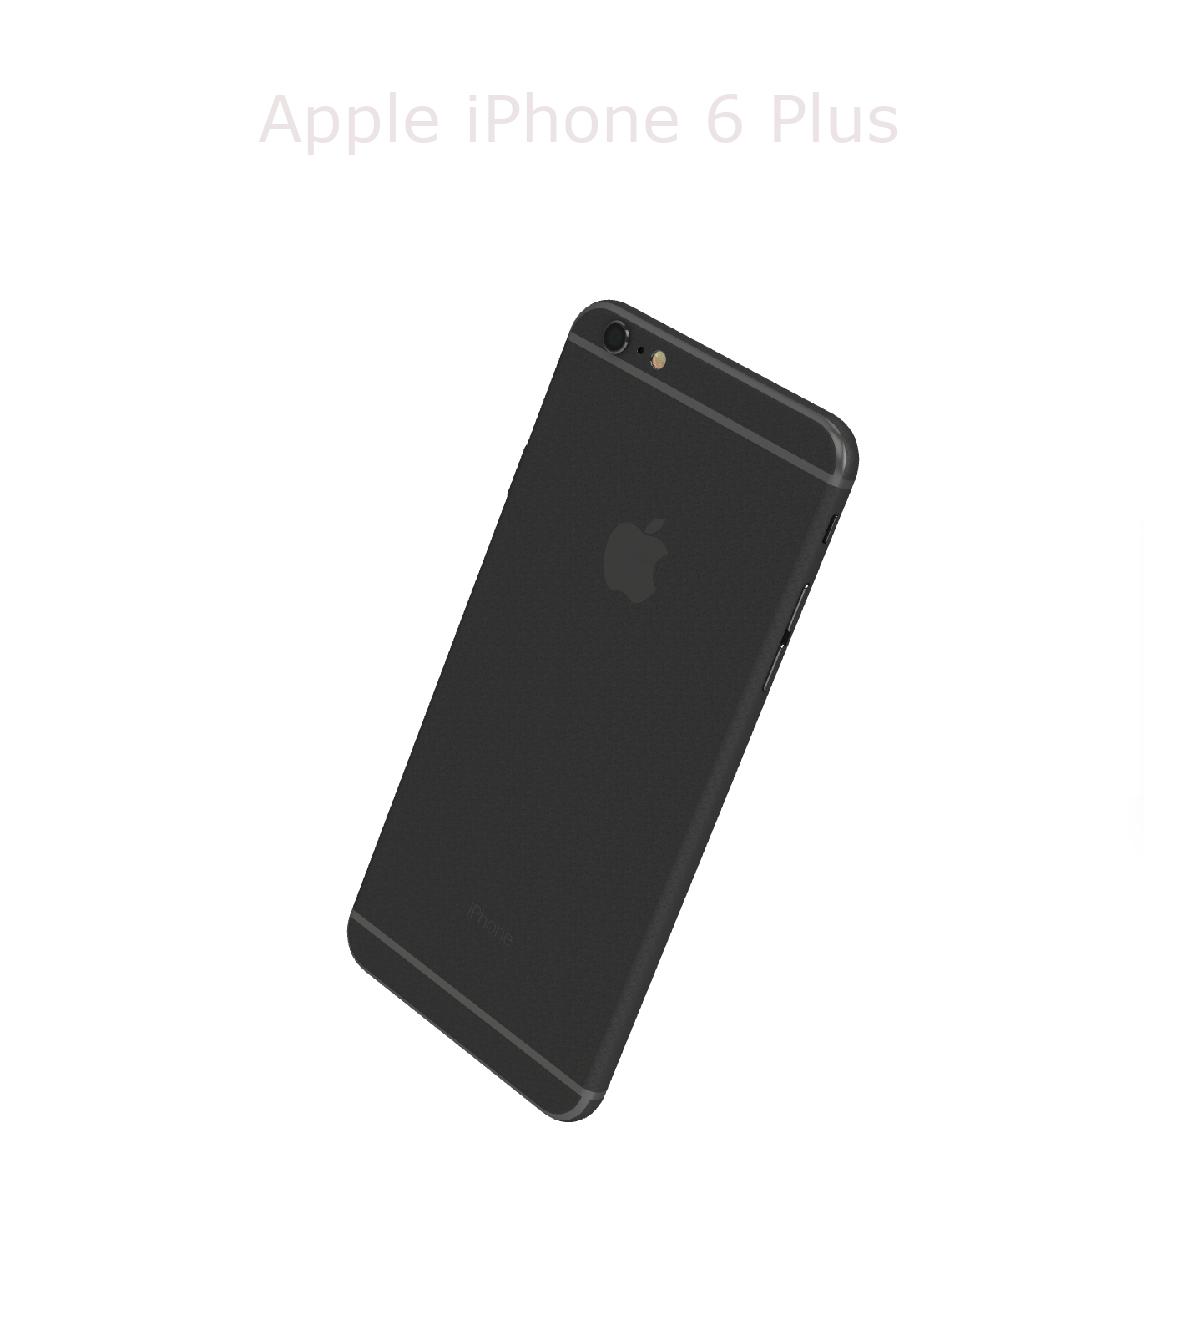 Laga baksida/chassi iPhone 6 plus